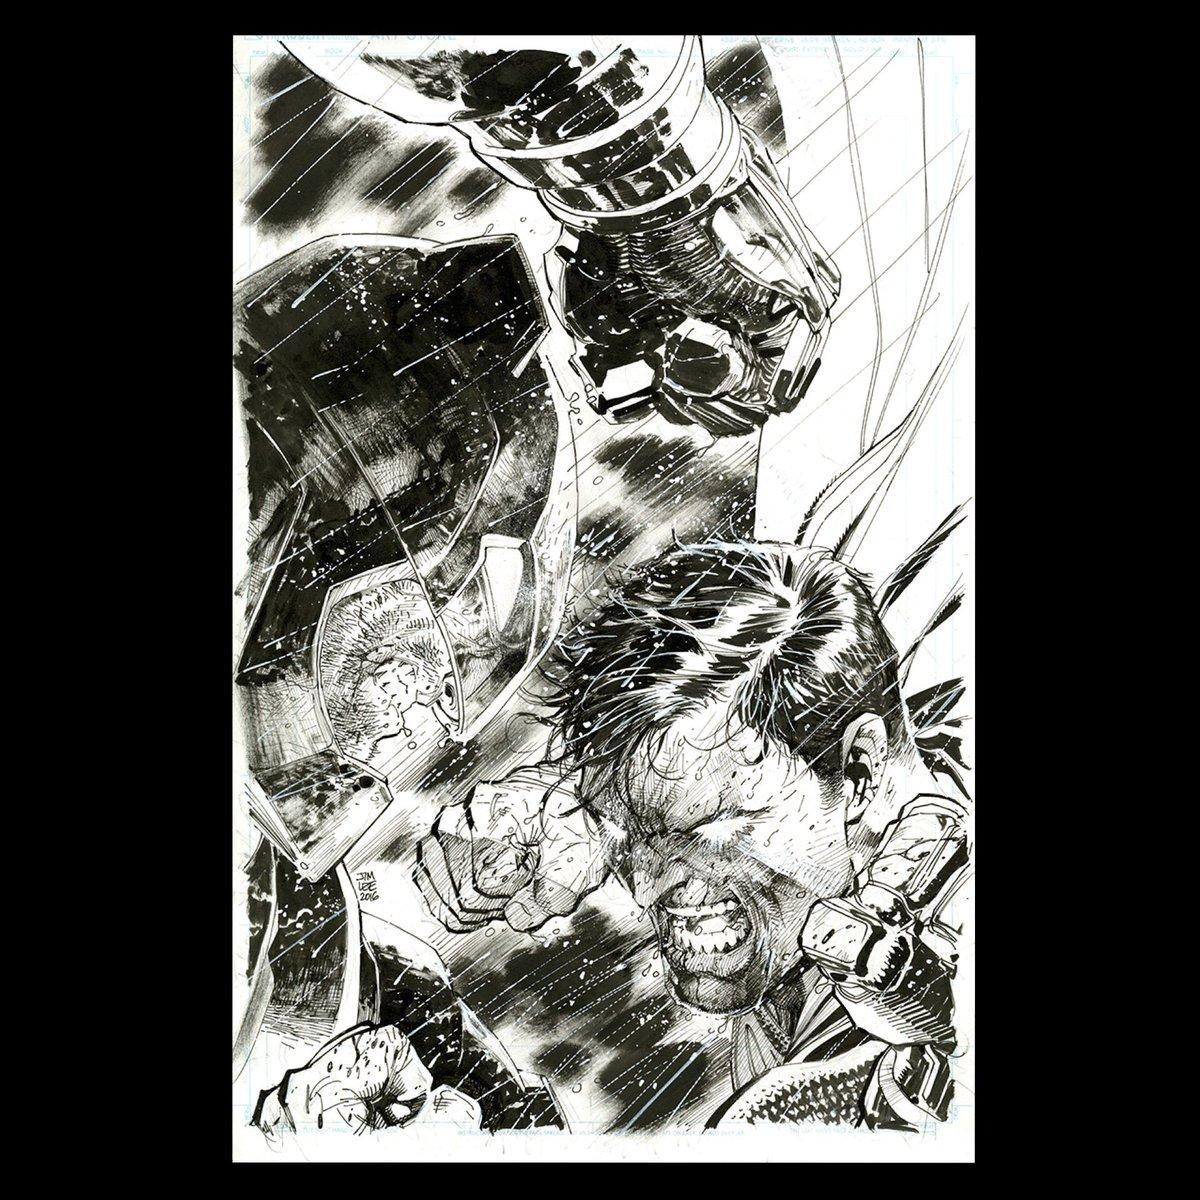 Finished Batman V Superman cover #BatmanvSuperman #dccomics #whowillwin https://t.co/H2ATfxa8Dk